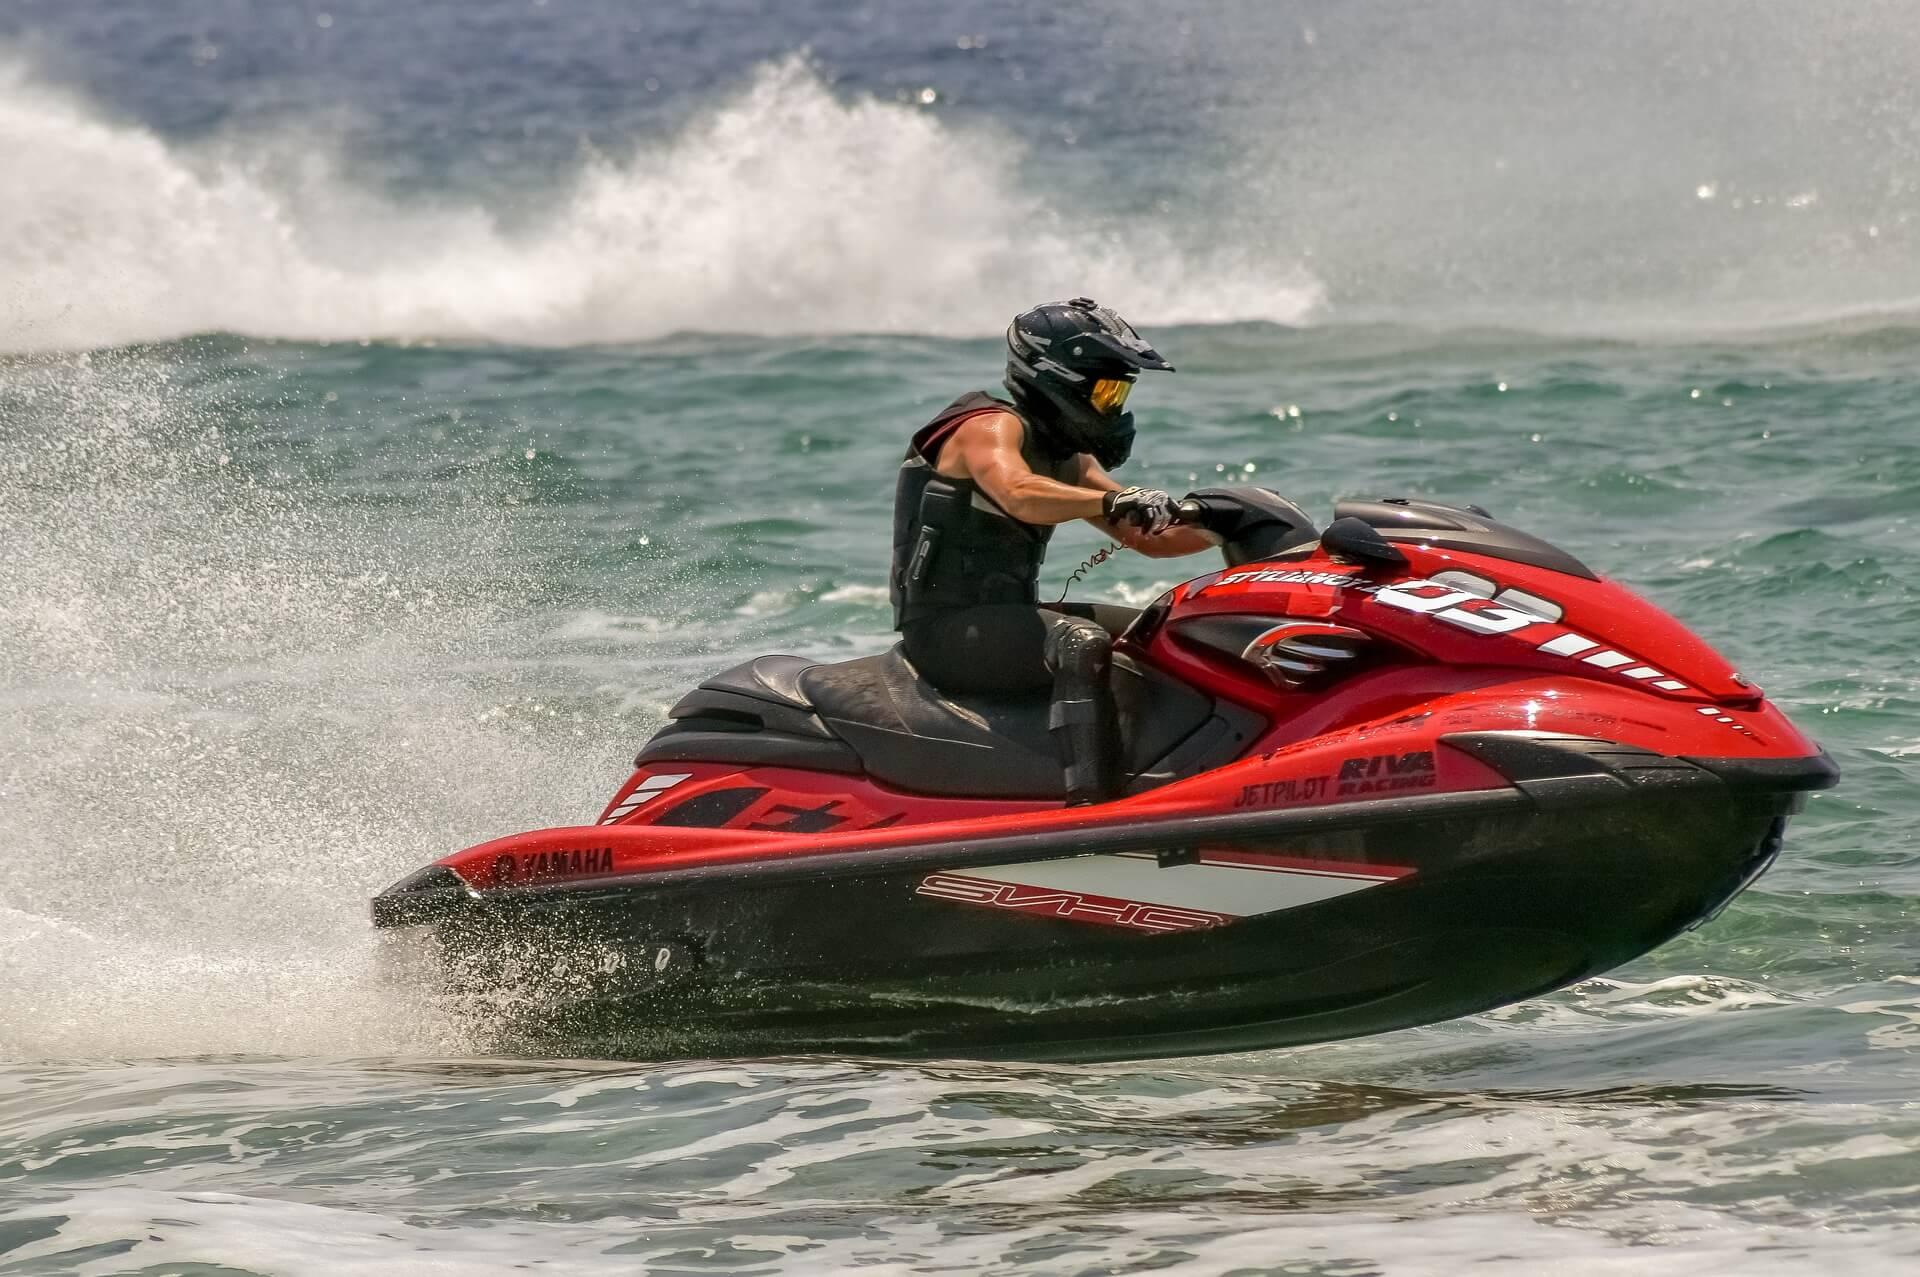 jet skis - watercrafts - jet ski - personal watercrafts